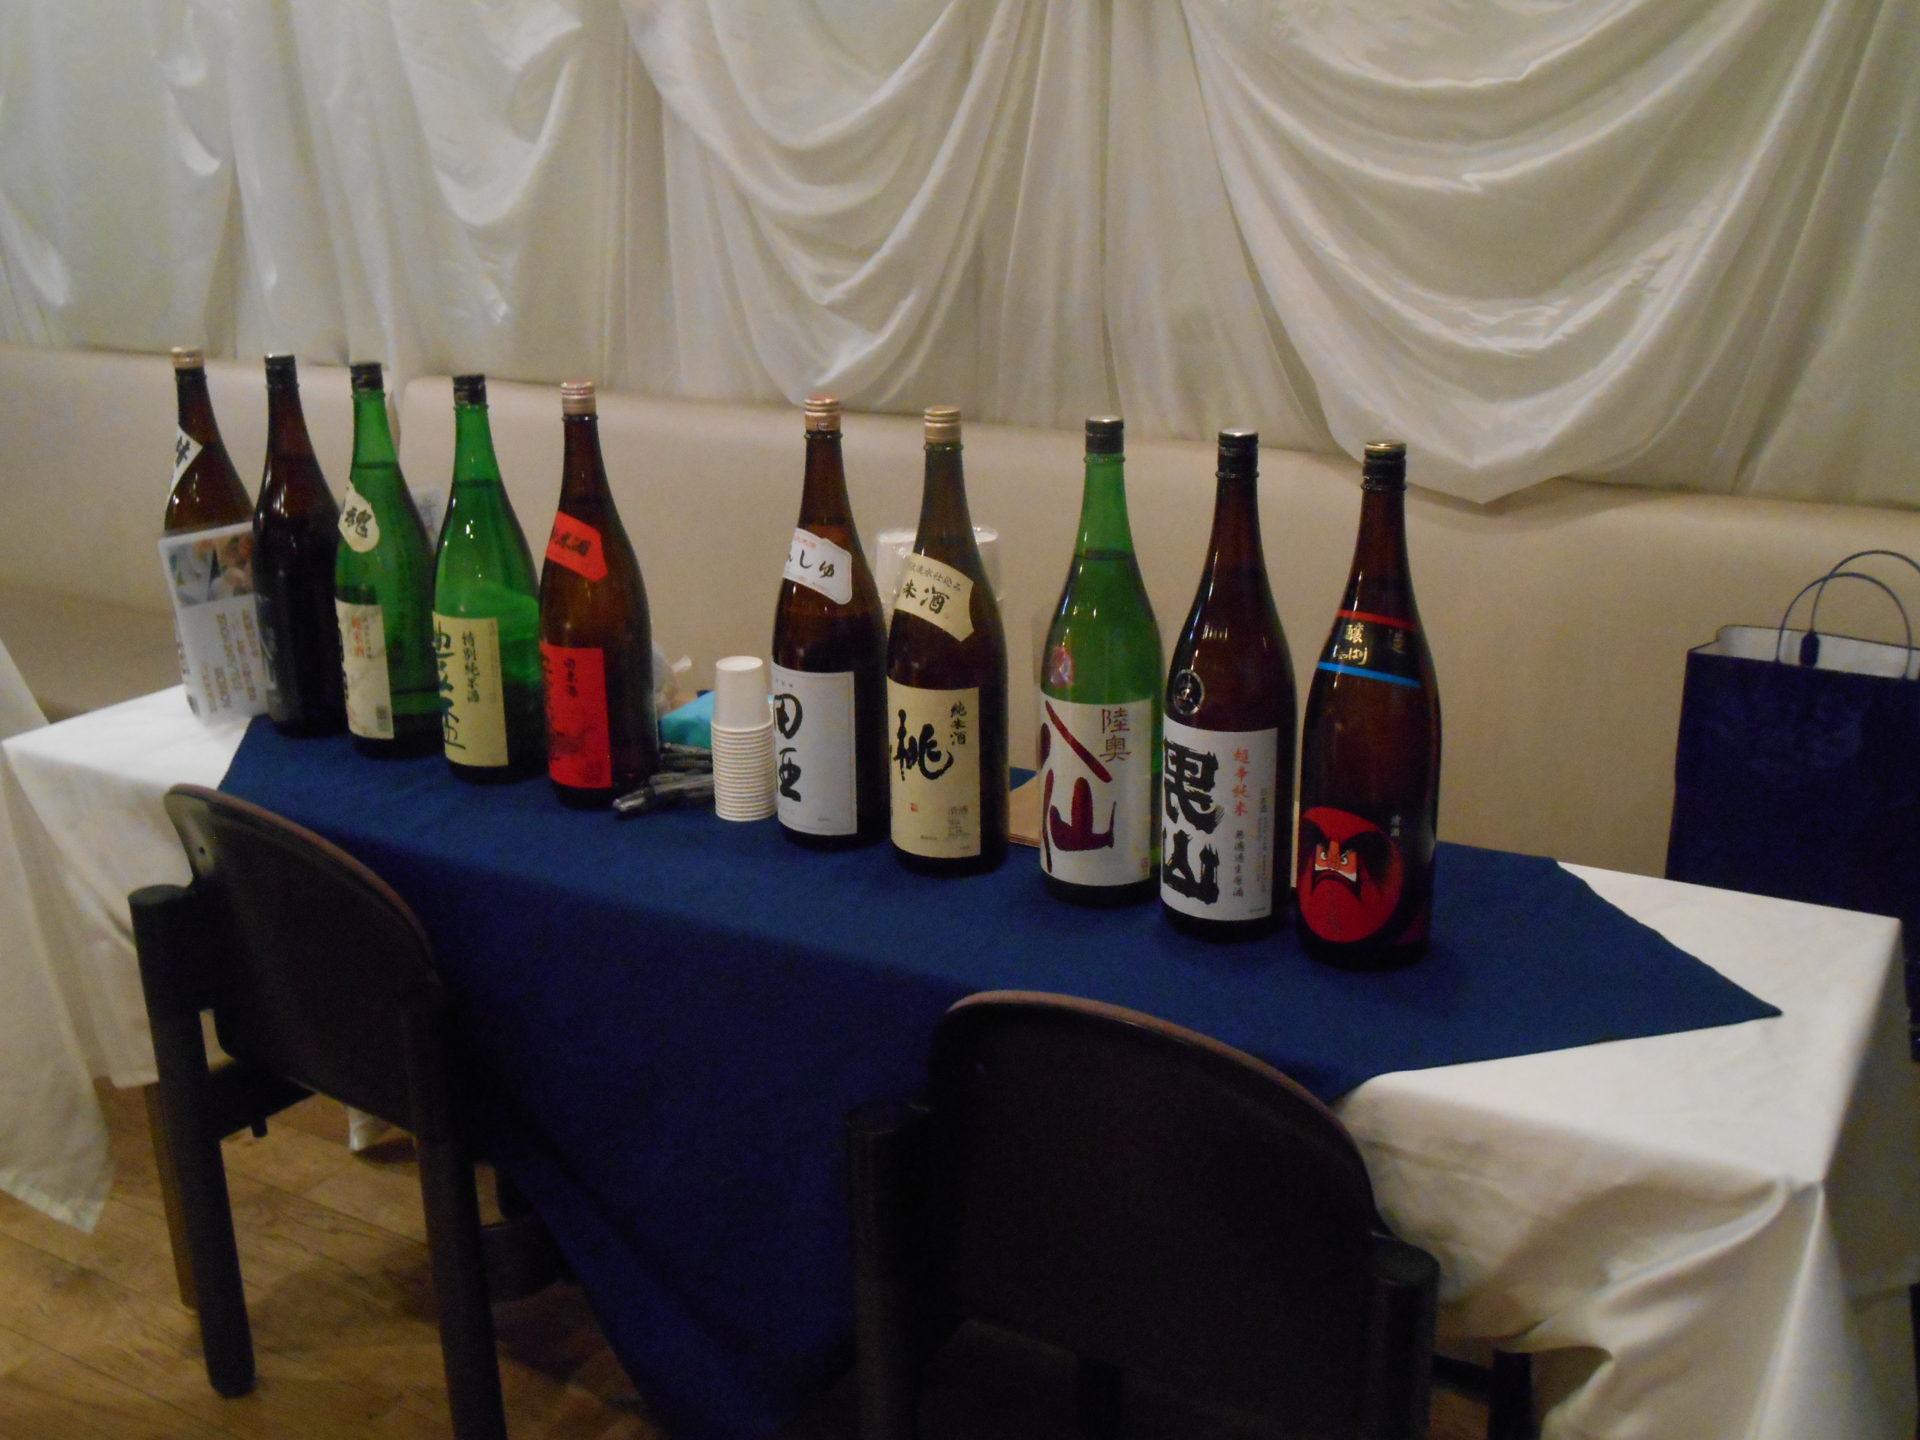 DSCN1010 1920x1440 - 2016年3月11日(金)AOsuki総会&パーティー開催しました。